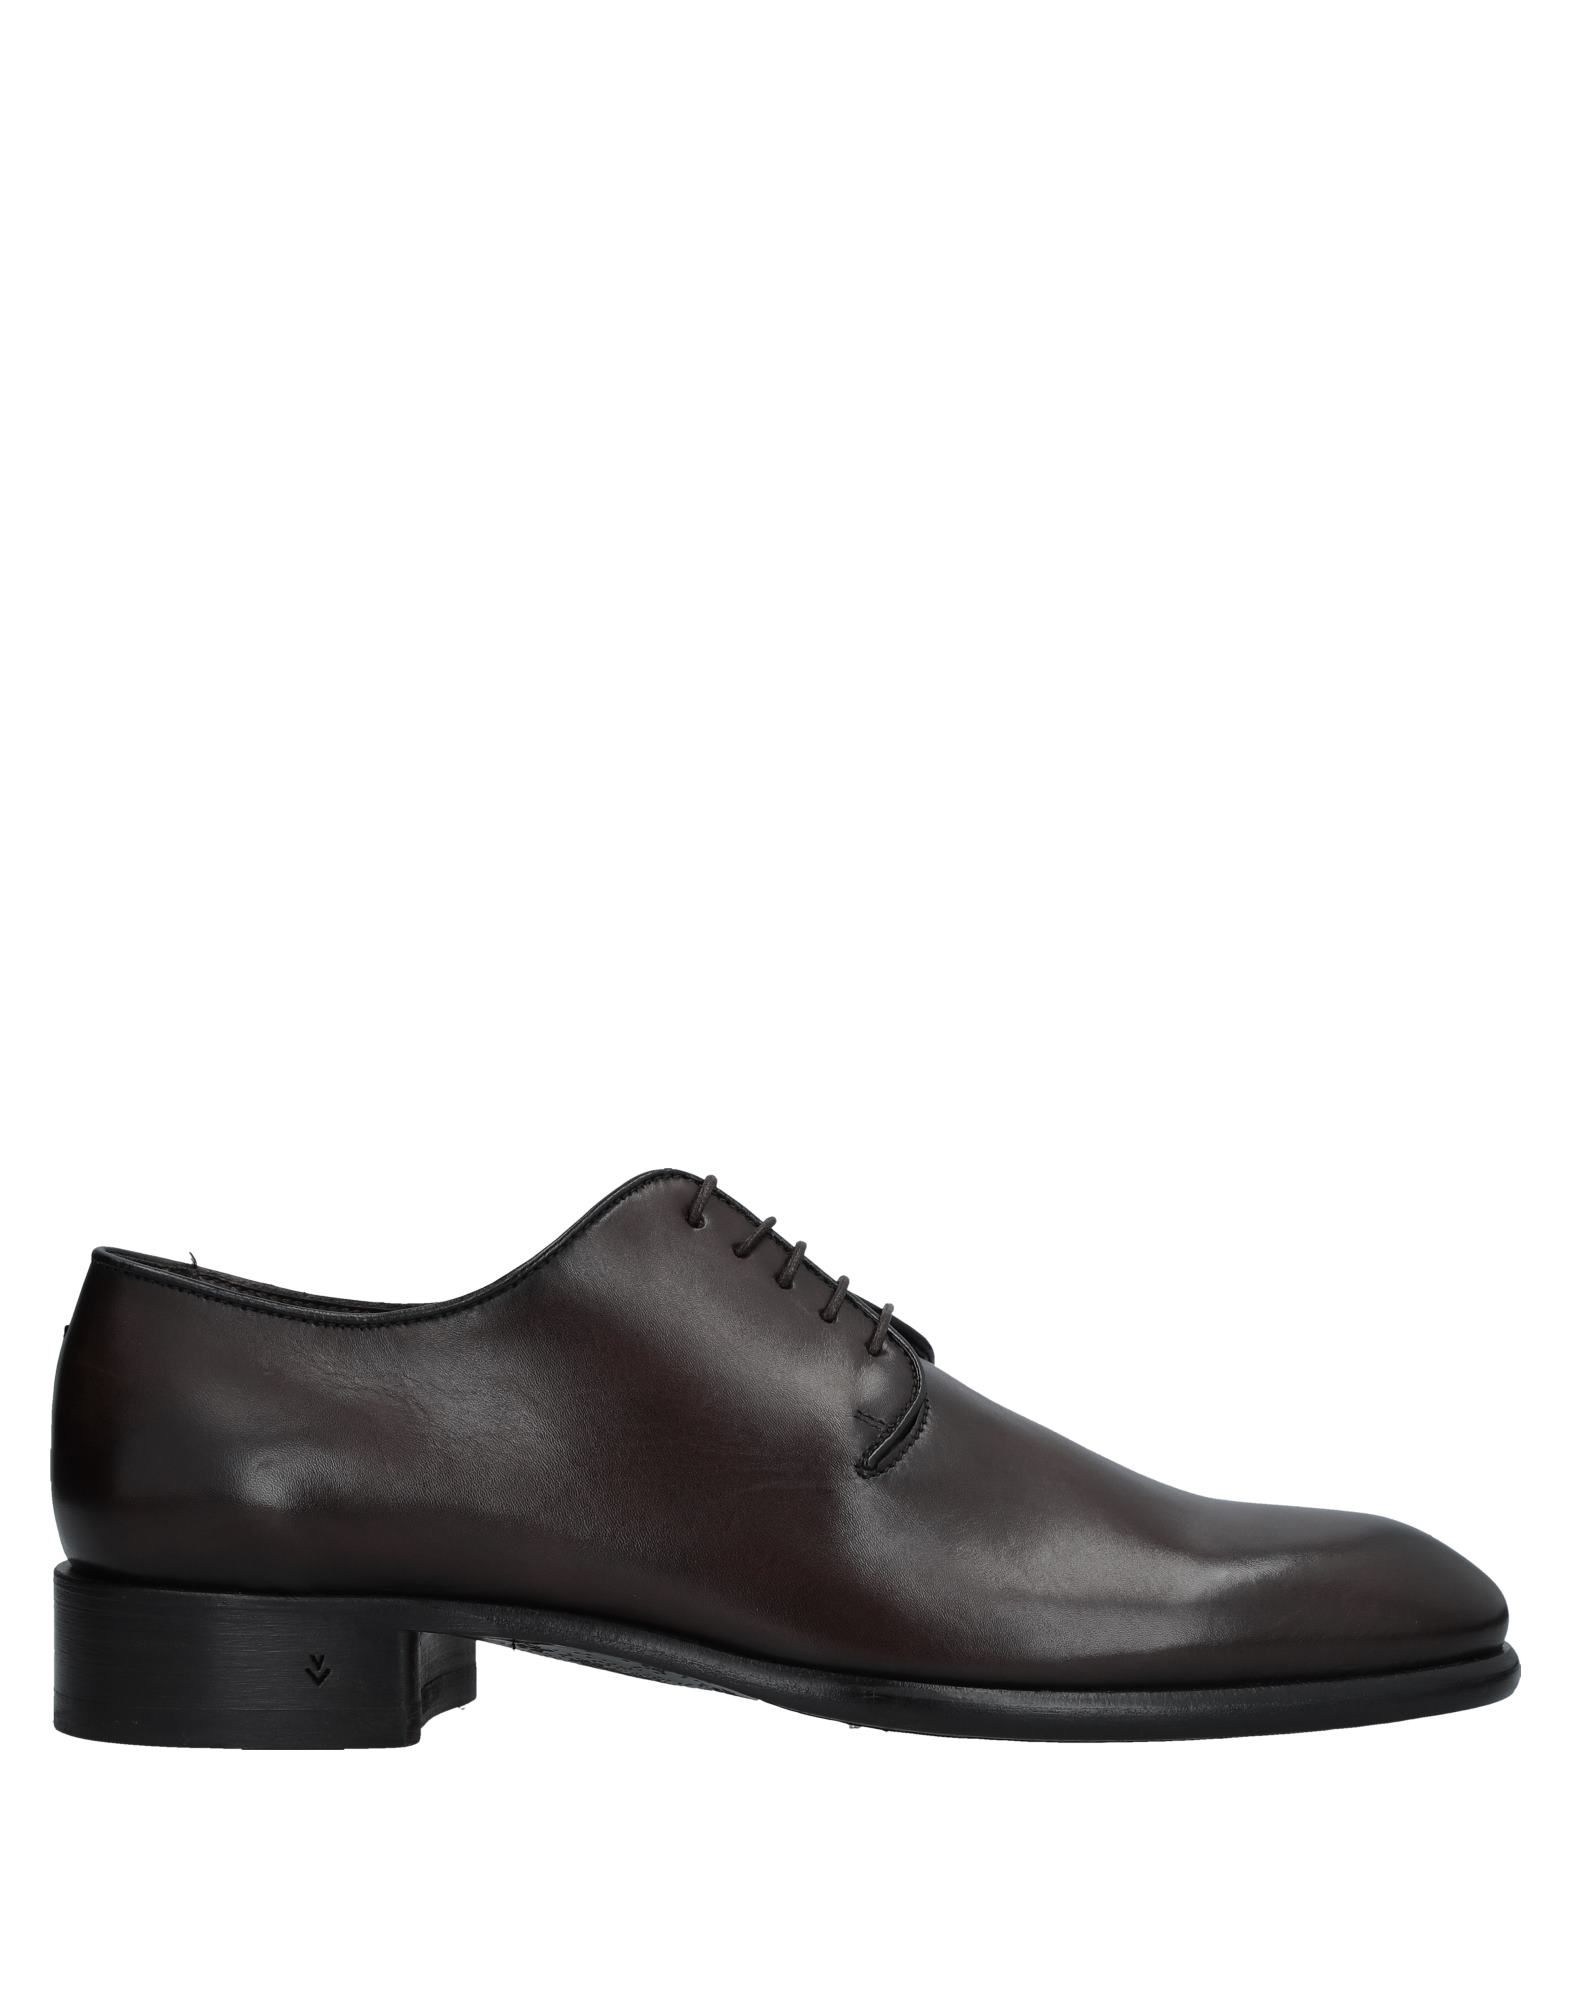 JOHN VARVATOS Обувь на шнурках цены онлайн